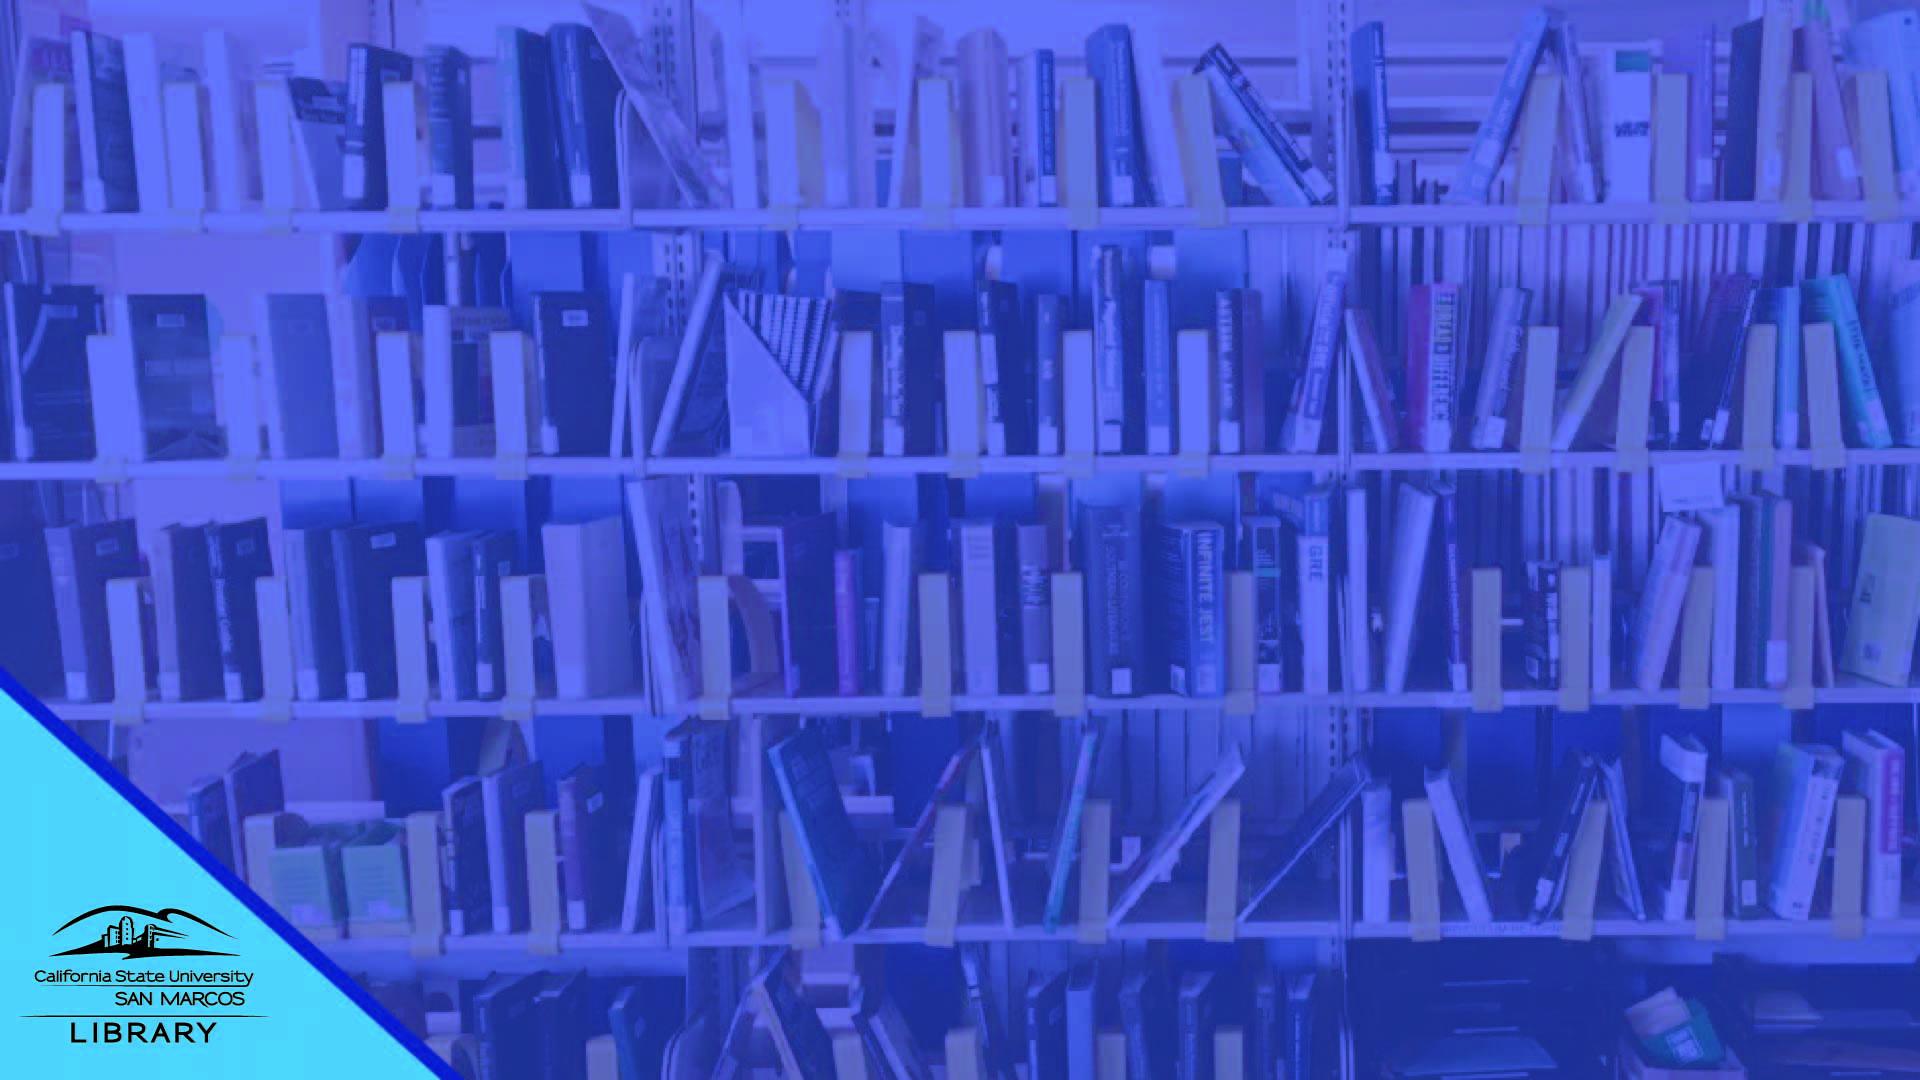 Books on Shelves Zoom Background